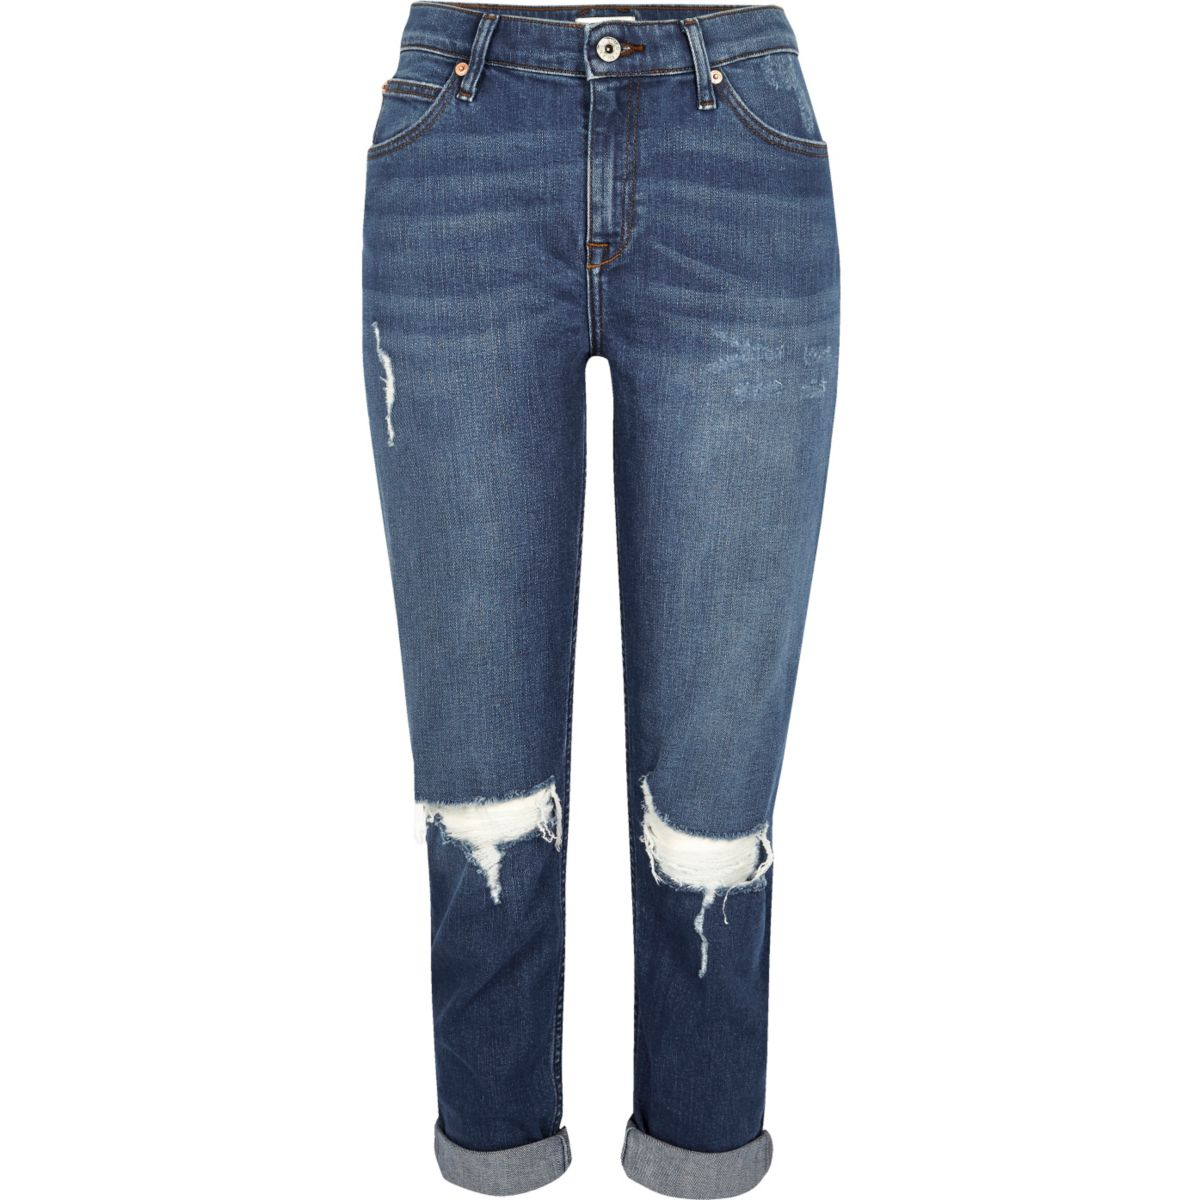 Ashley – Dunkelblaue Boyfriend-Jeans im Used-Look